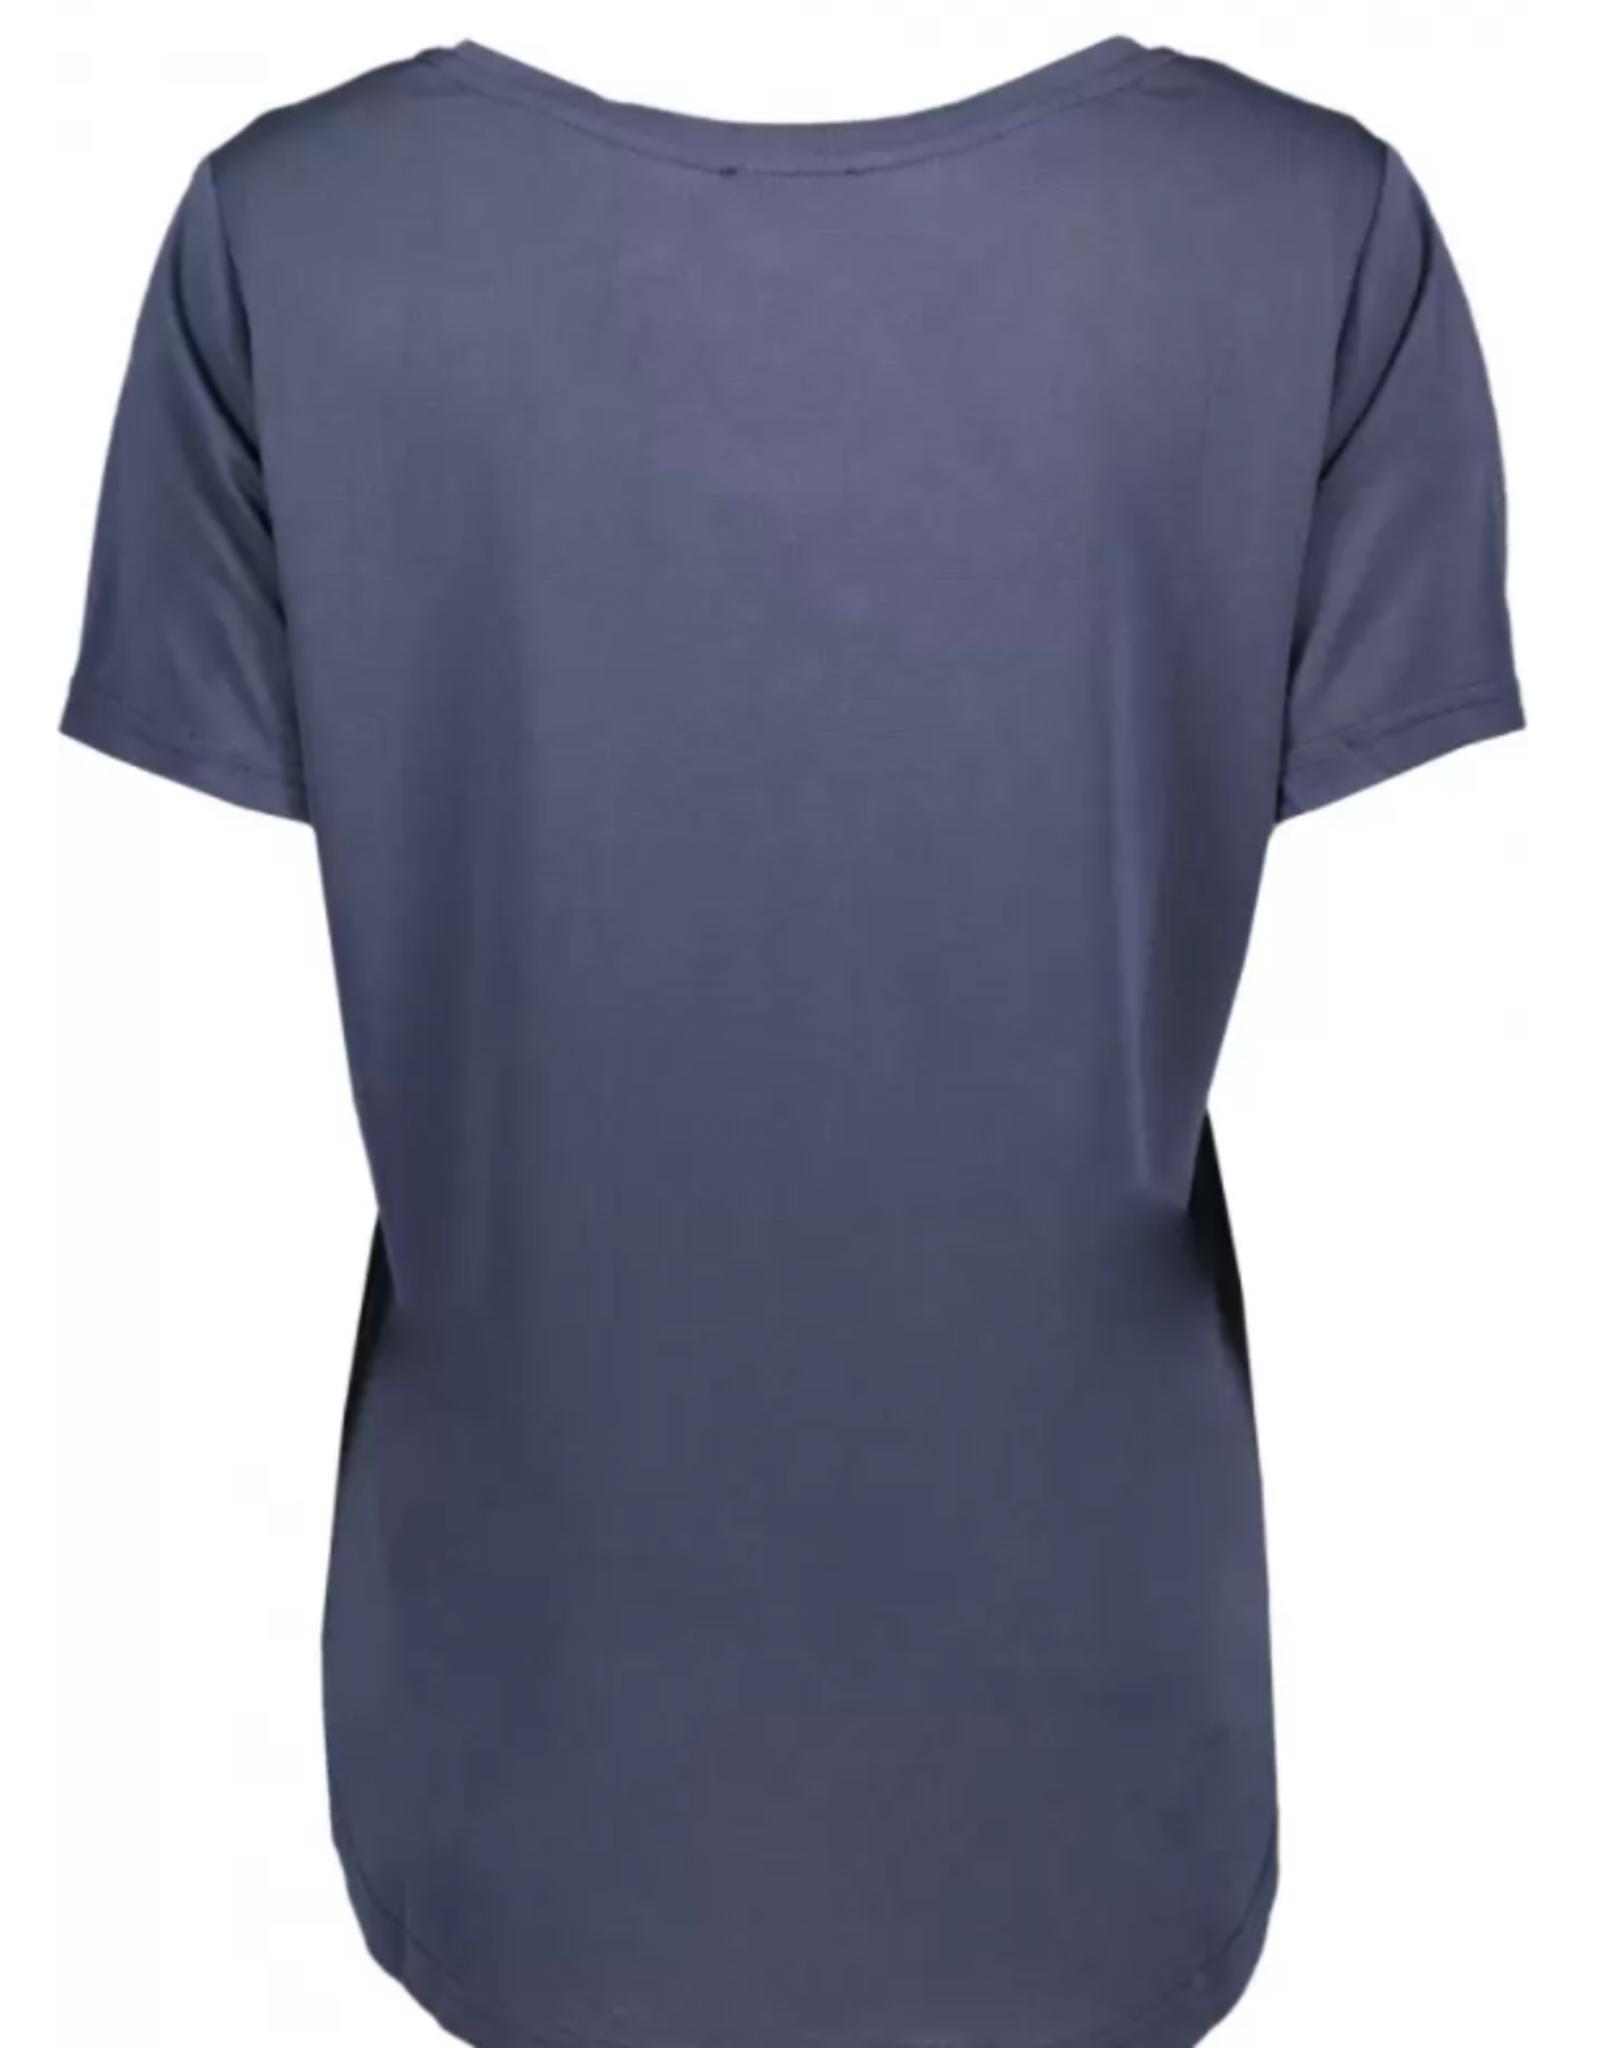 JcSophie T Shirt Golden  Navy